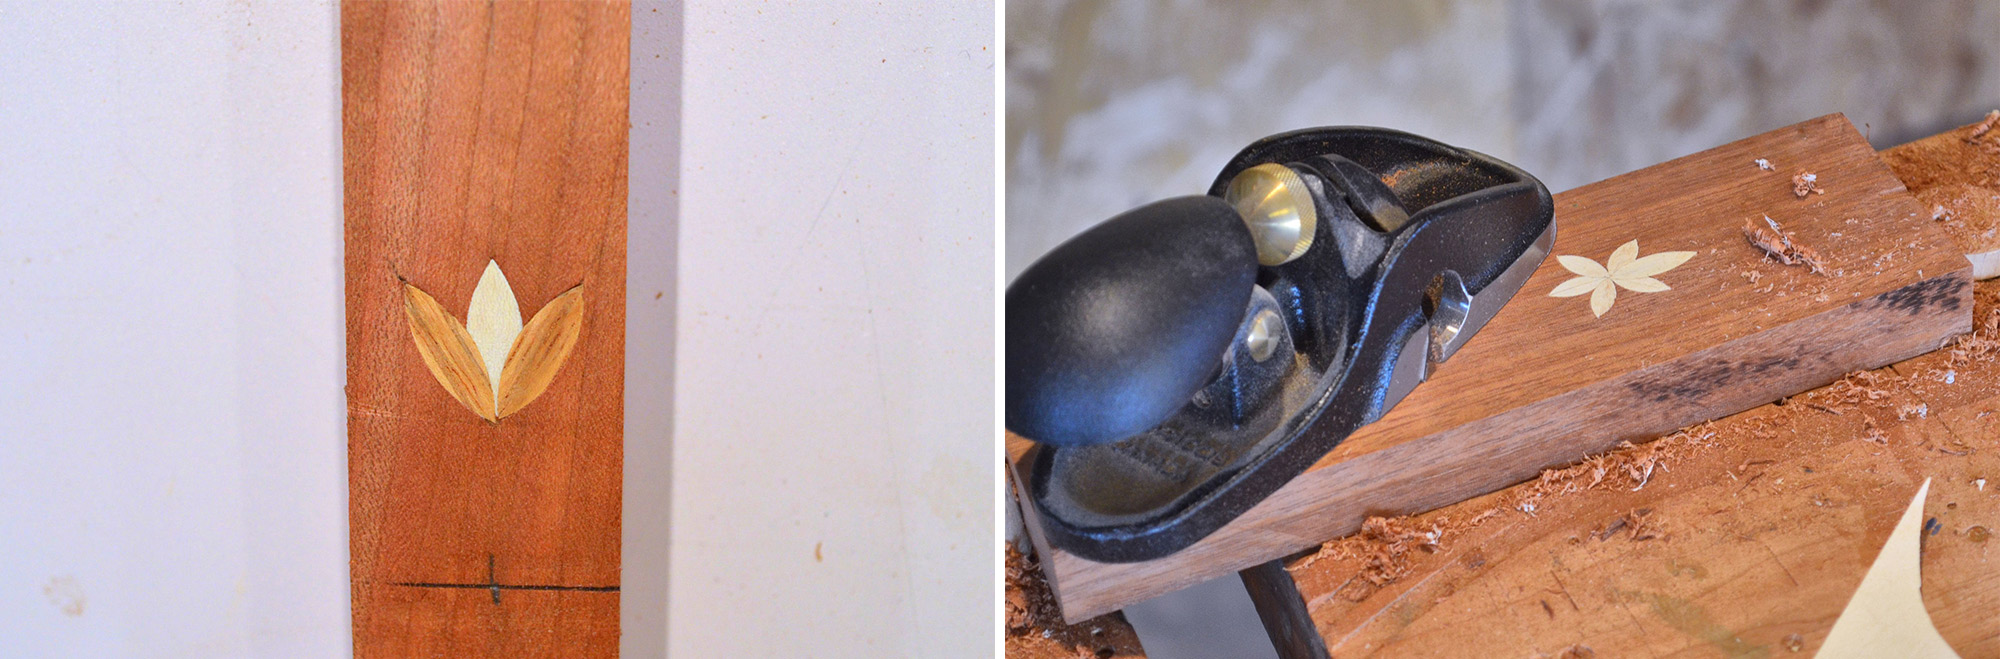 Image left: Variation. Image right: Six-point bellflower.